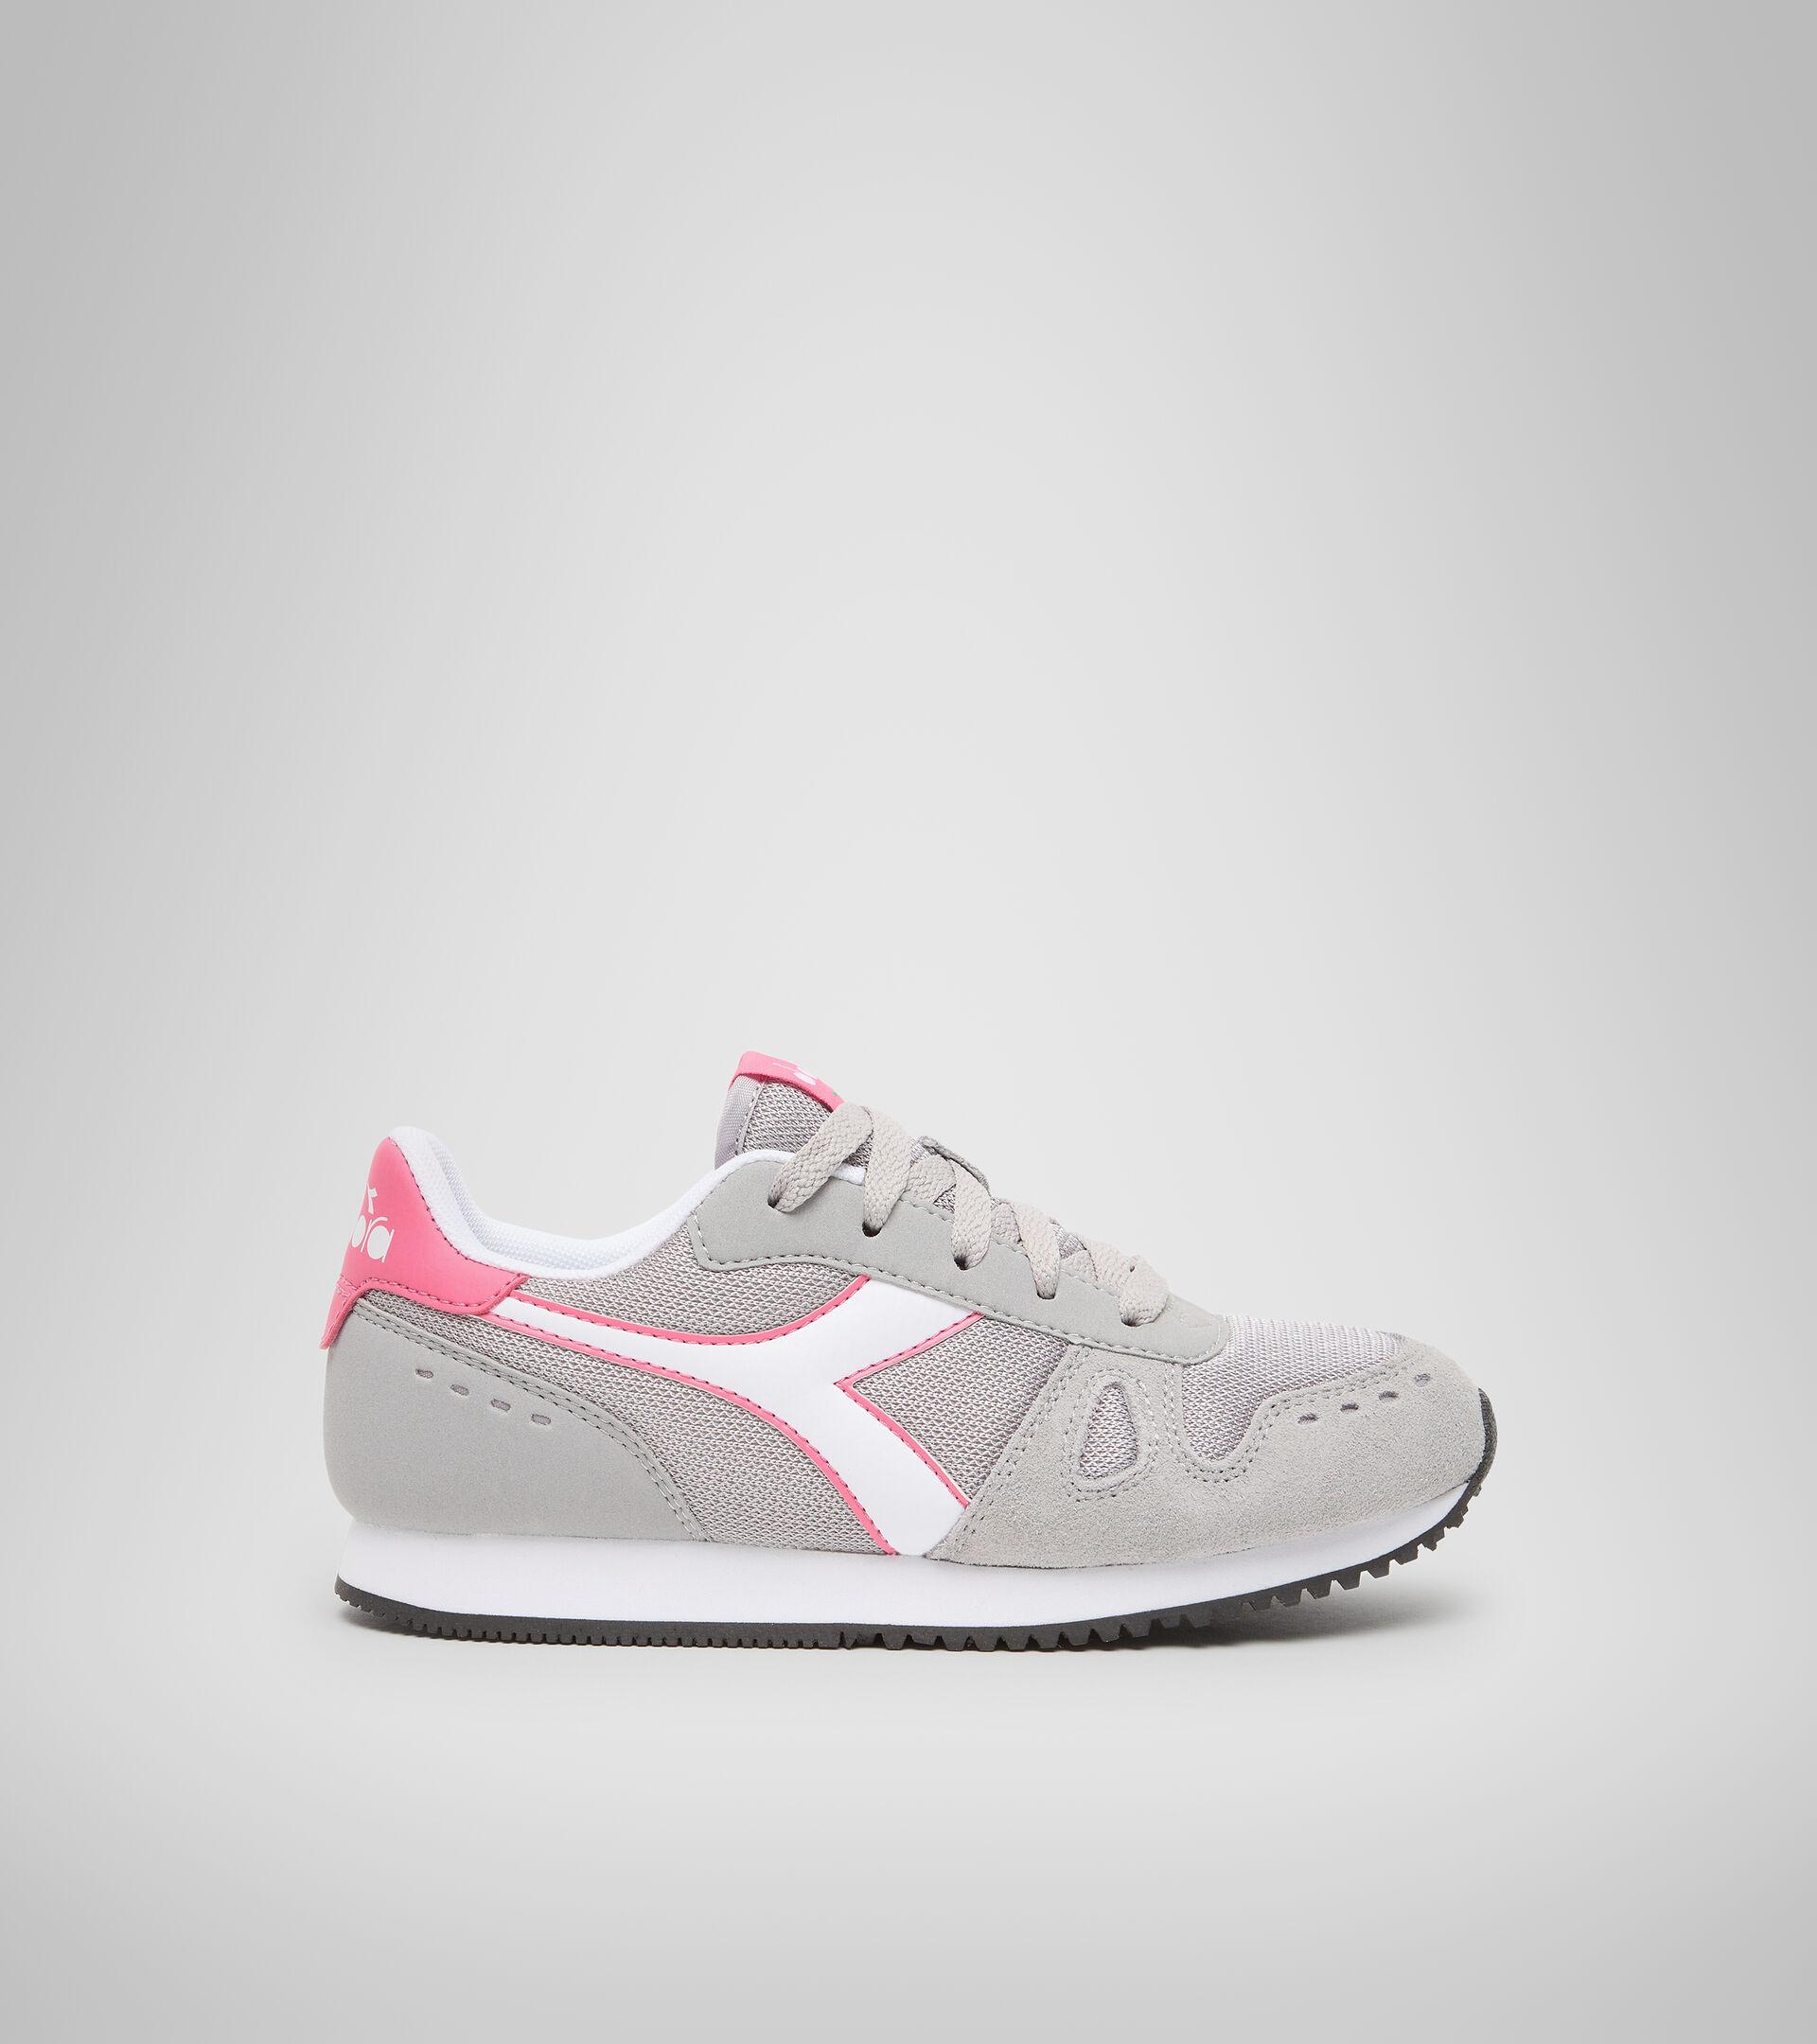 Footwear Sport BAMBINO SIMPLE RUN GS GRIS PALOMA Diadora